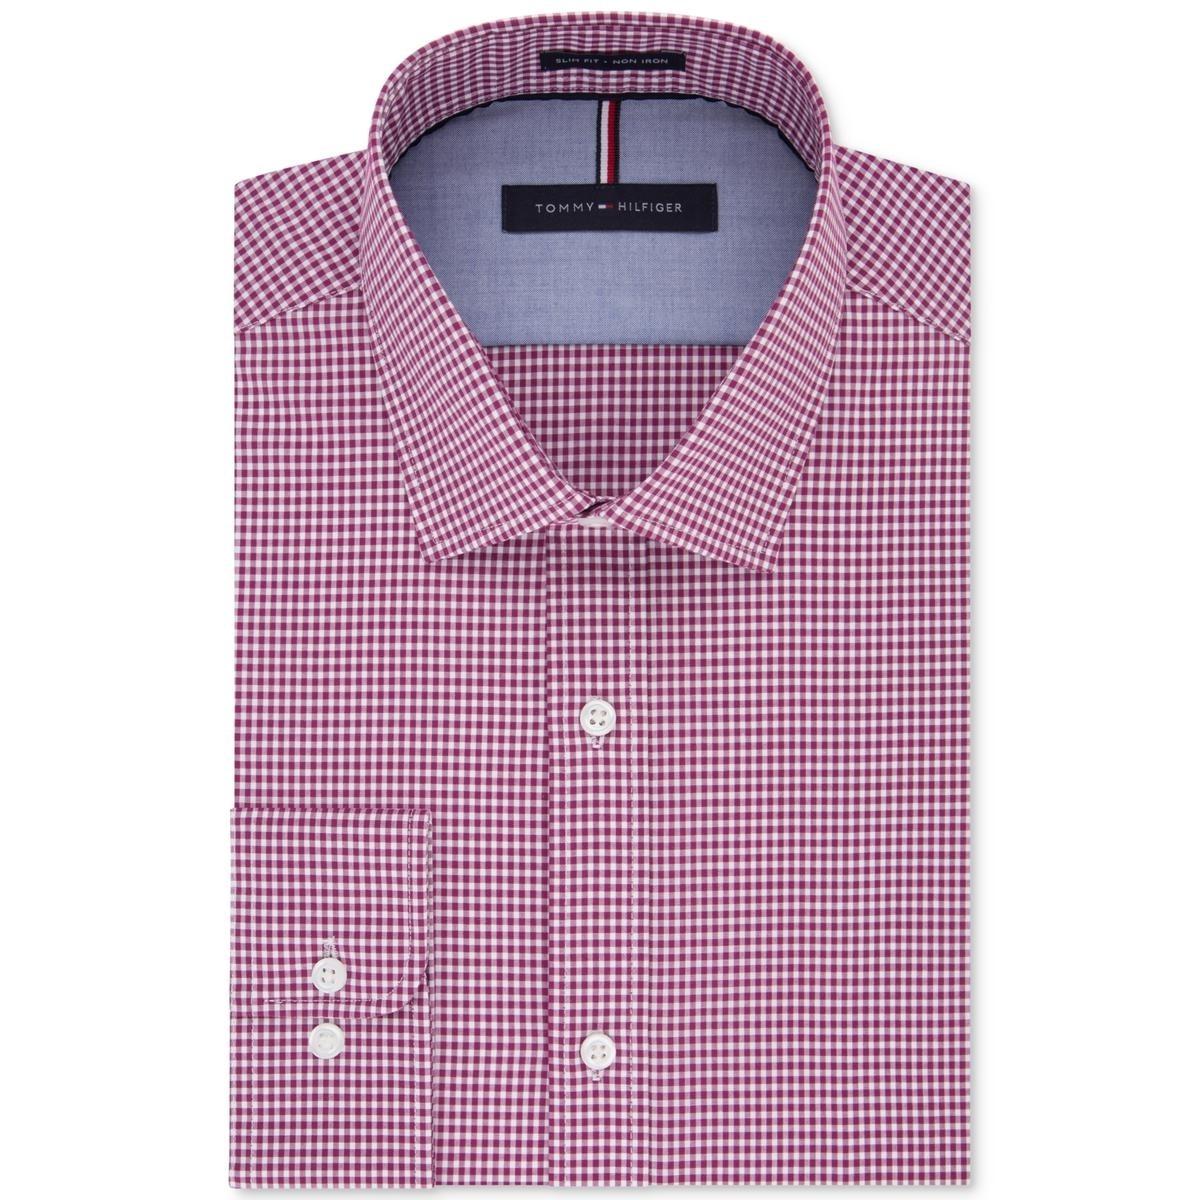 Shop Tommy Hilfiger Mens Big Tall Button Down Shirt Gingham Non